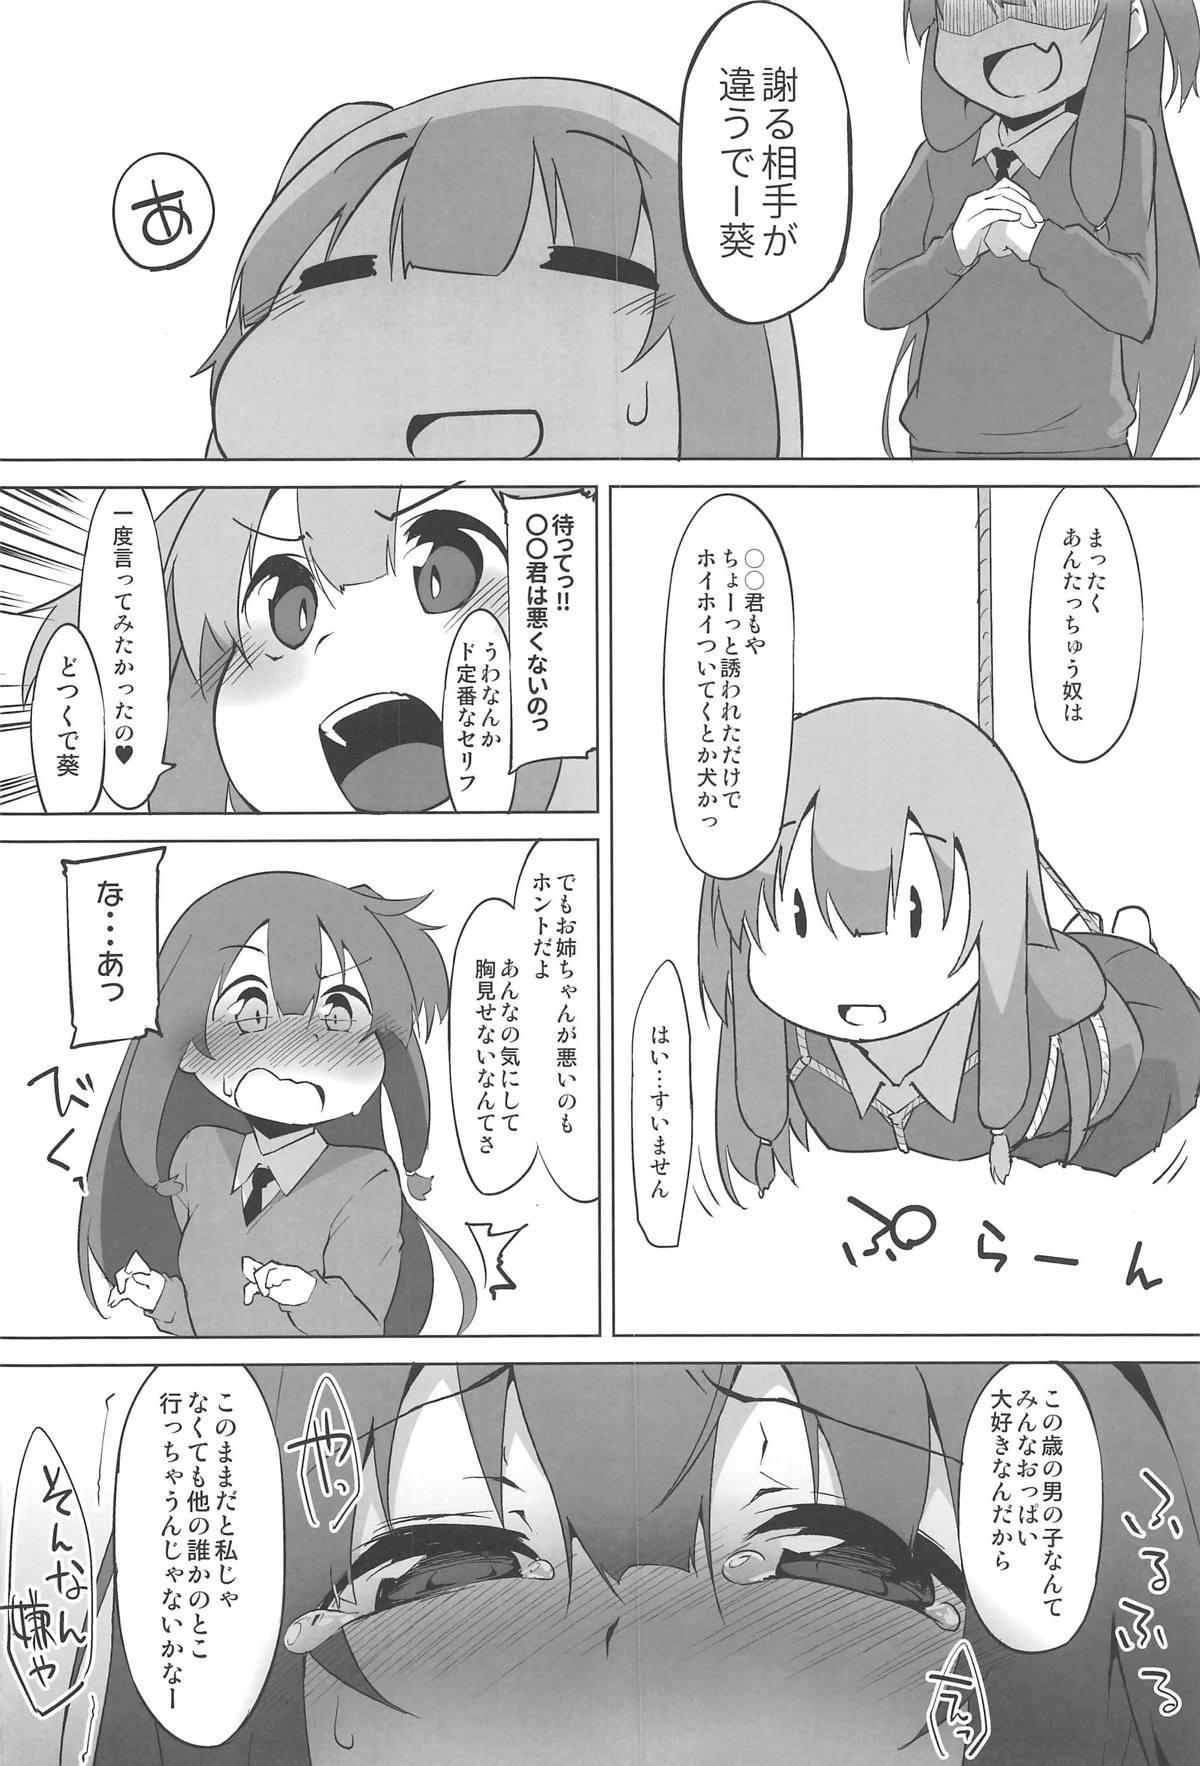 Himegoto Shimai 14